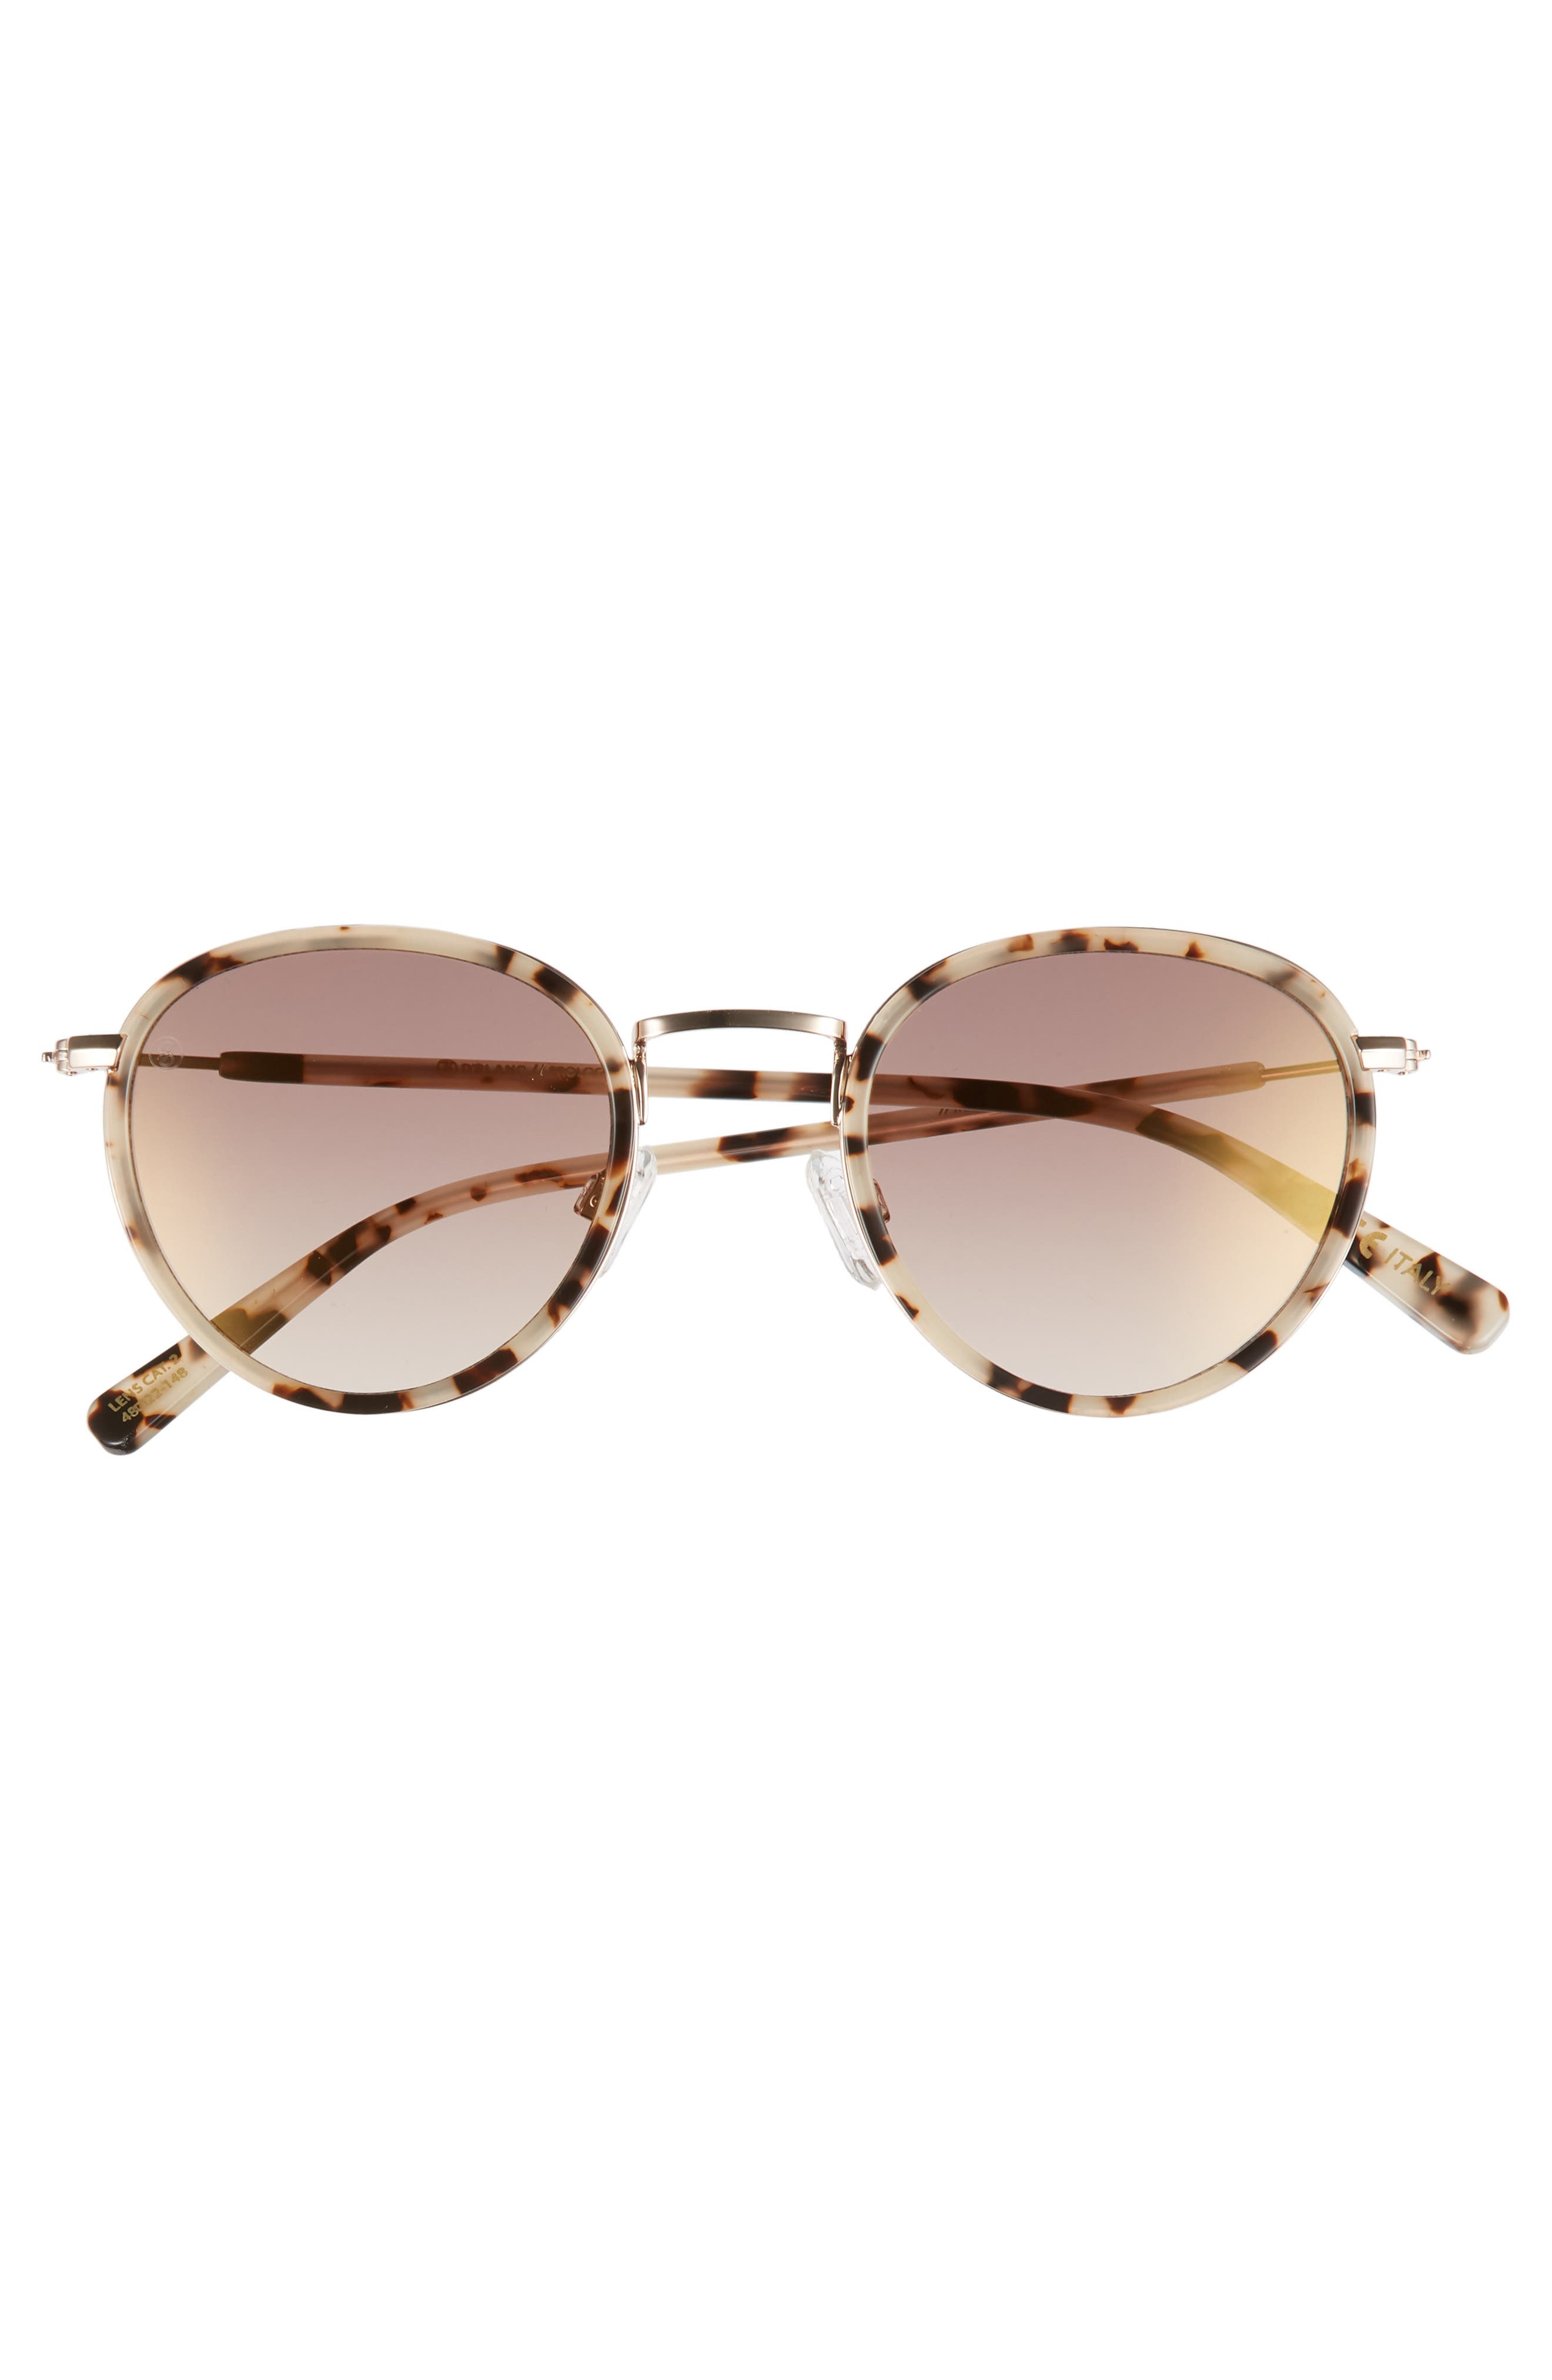 D'BLANC Prologue 48mm Round Sunglasses,                             Alternate thumbnail 3, color,                             200